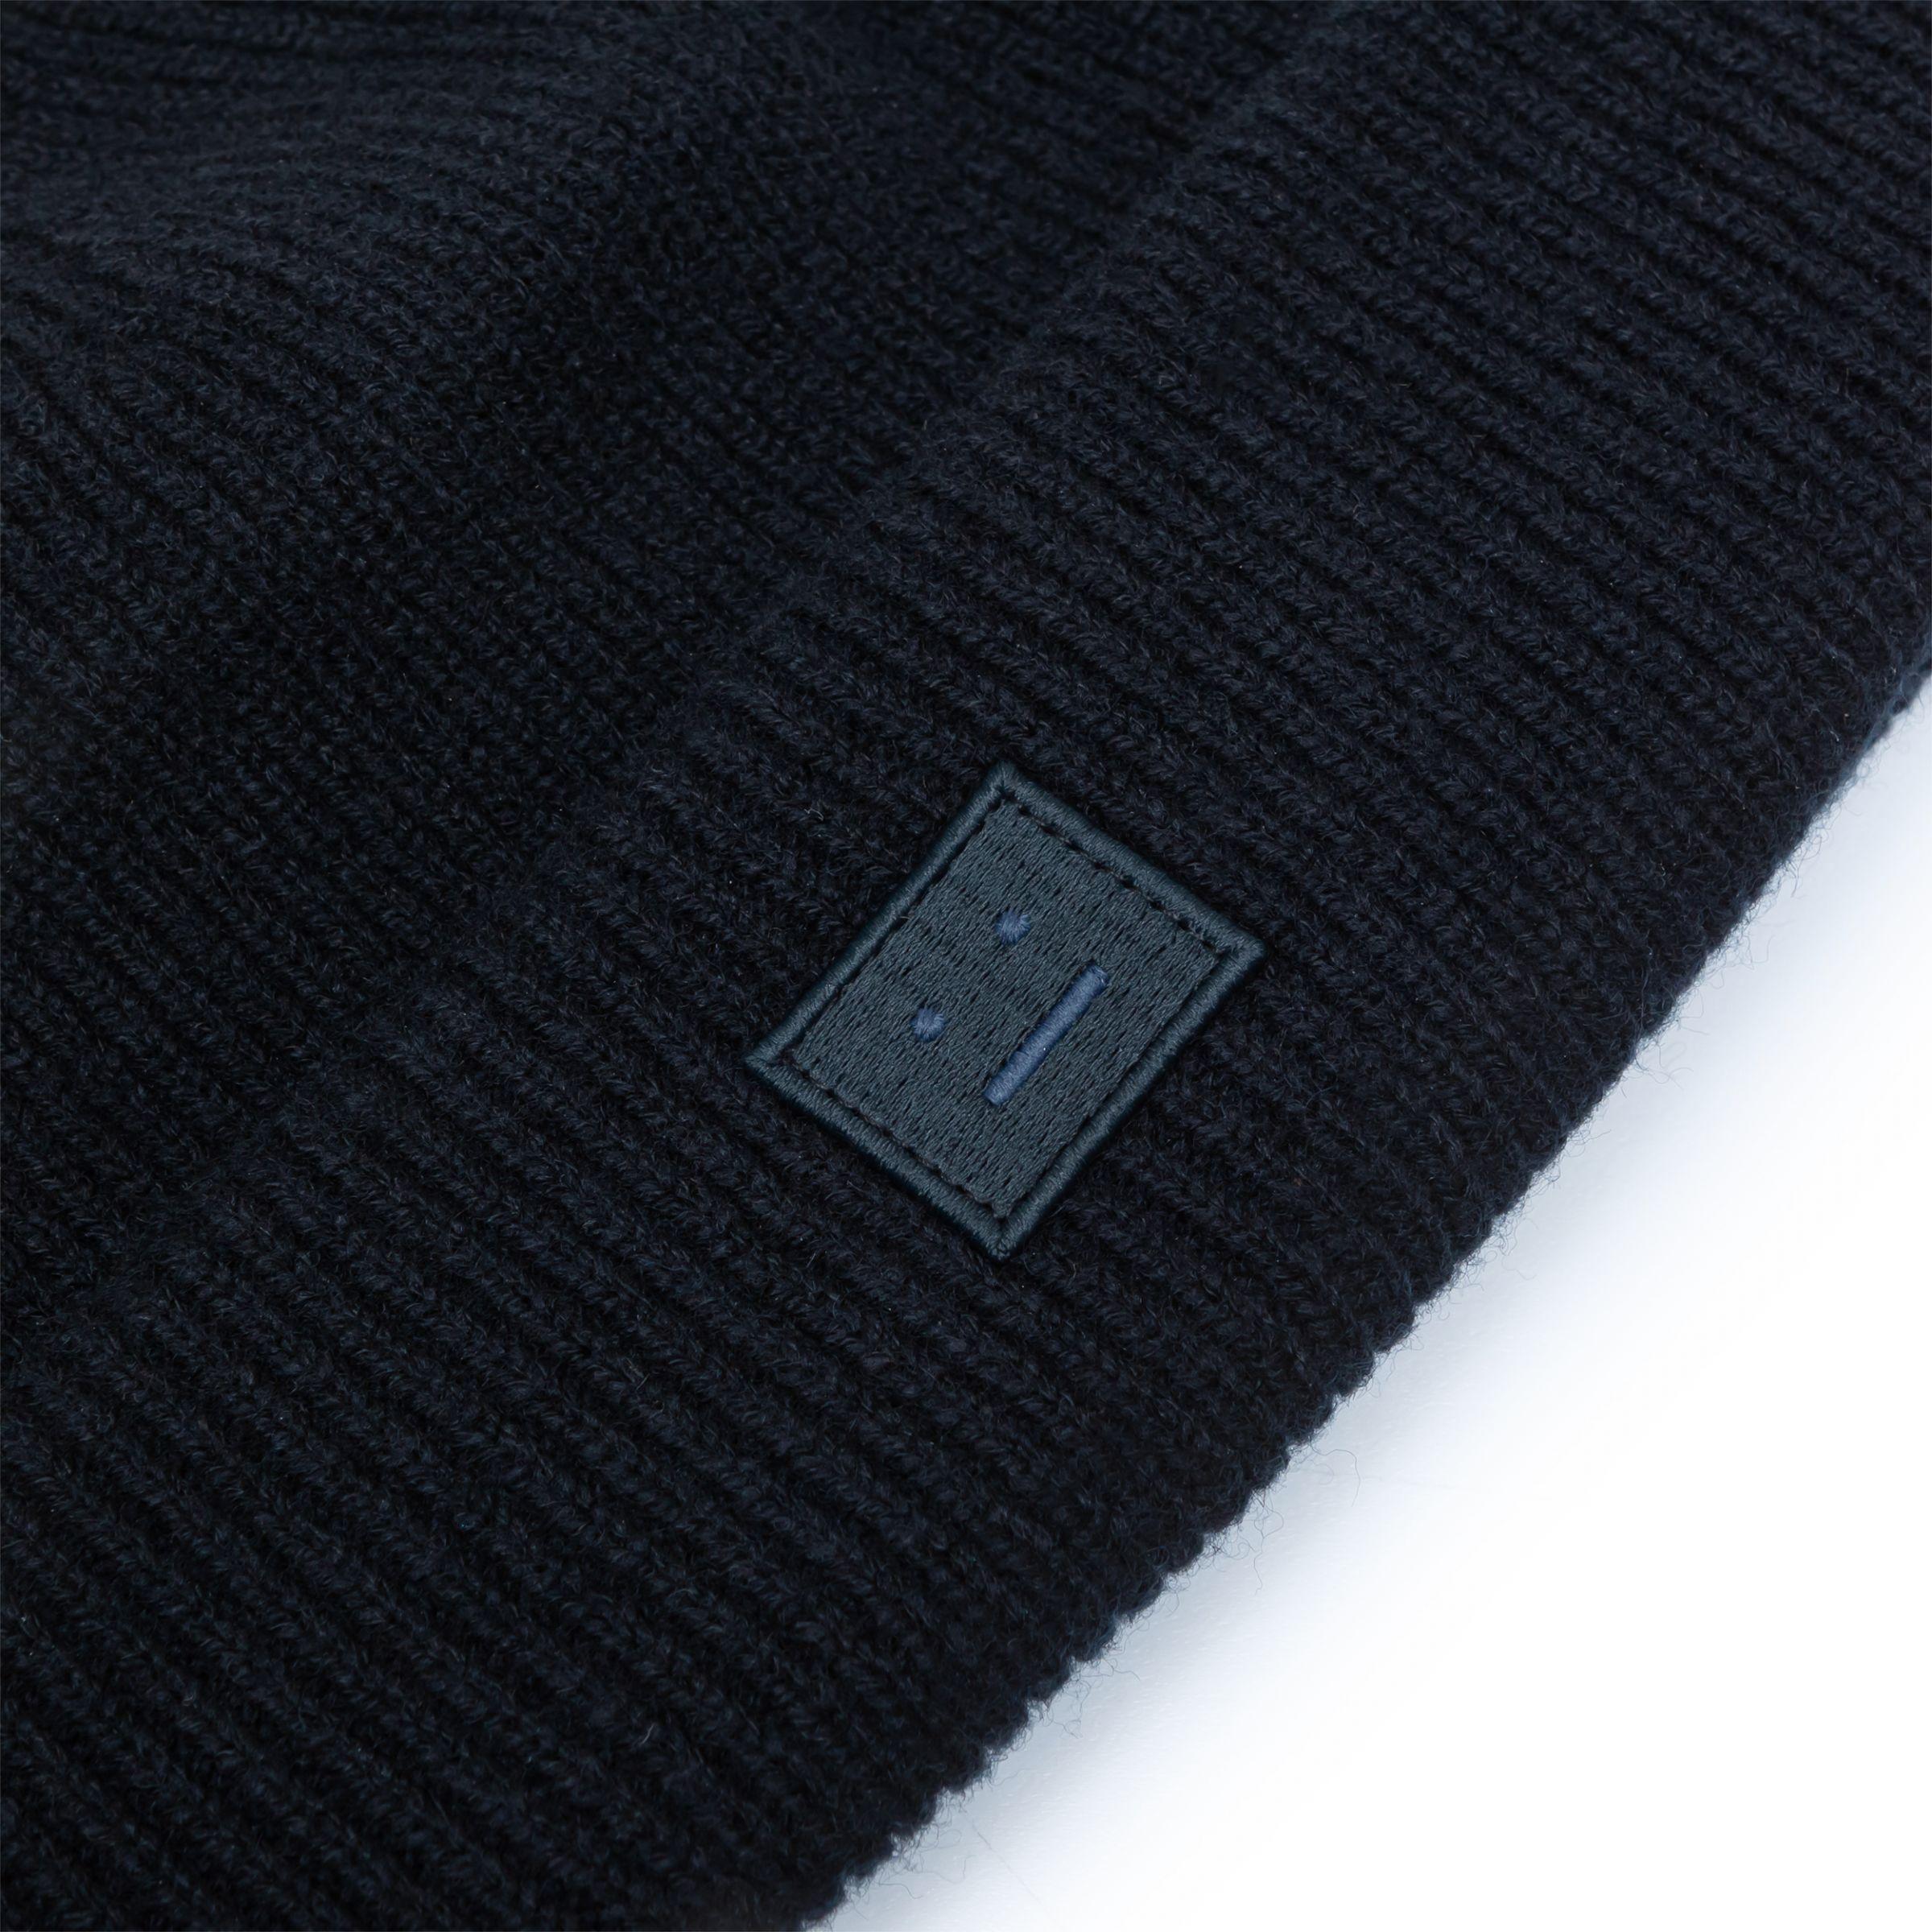 Шапка Acne Studios темно-синяя